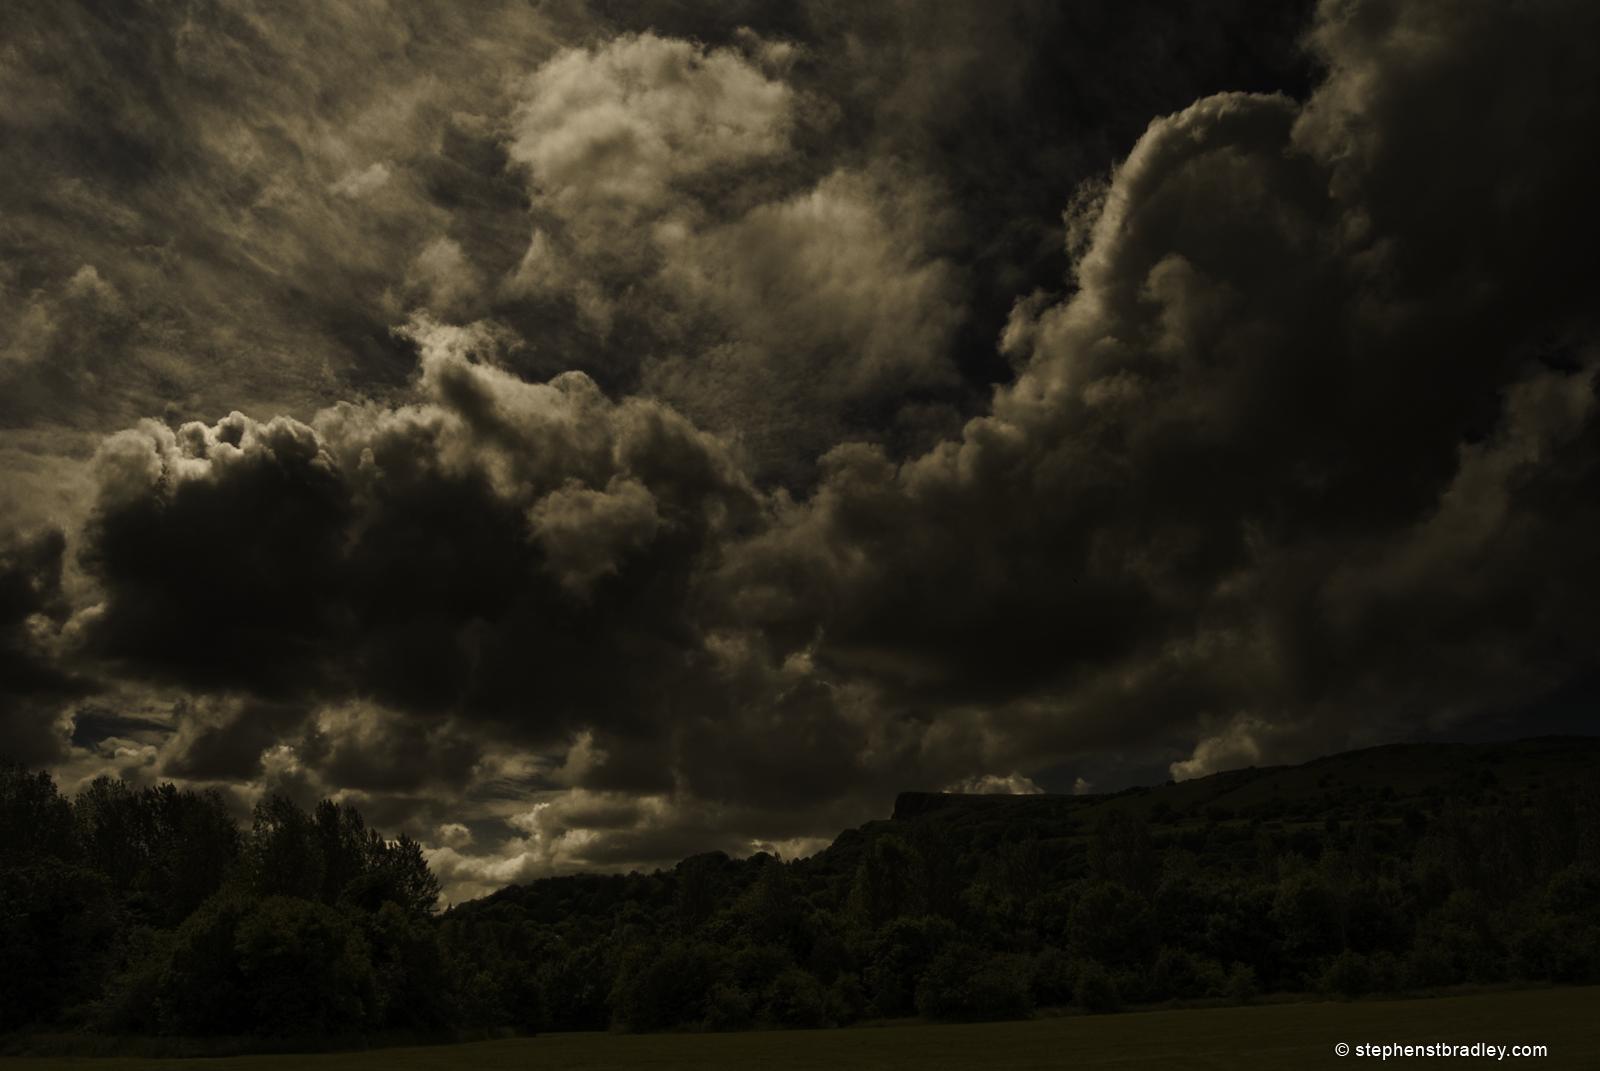 Cavehill Belfast, Northern Ireland landscape photograph 2231.